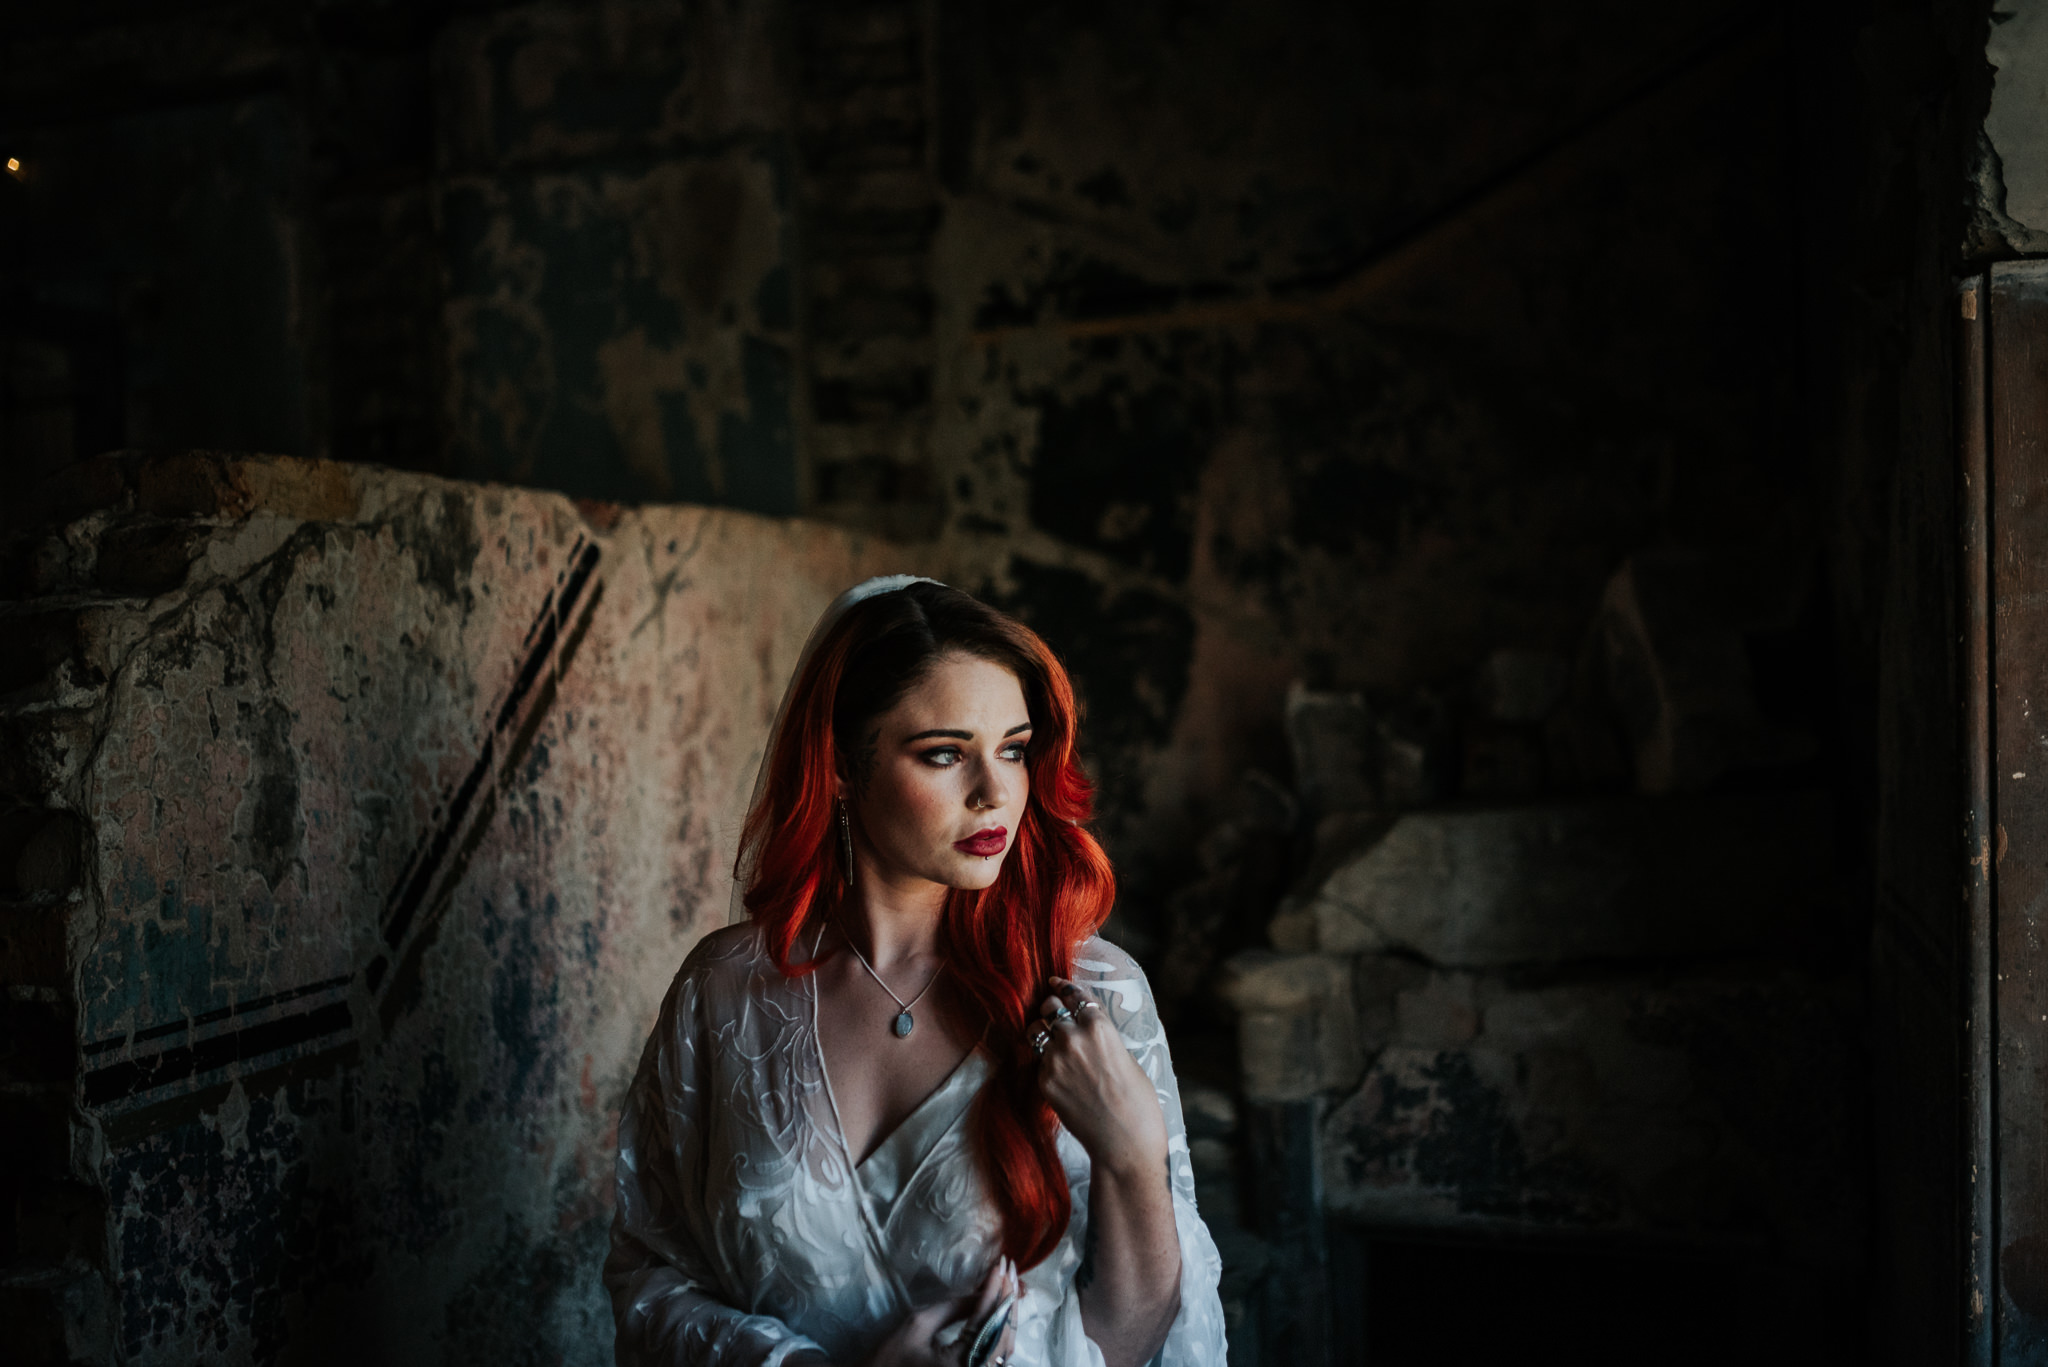 alternative chapel wedding- asylum london- unique london wedding venue- london wedding venue- Jenny Appleton Photography- red haired bride